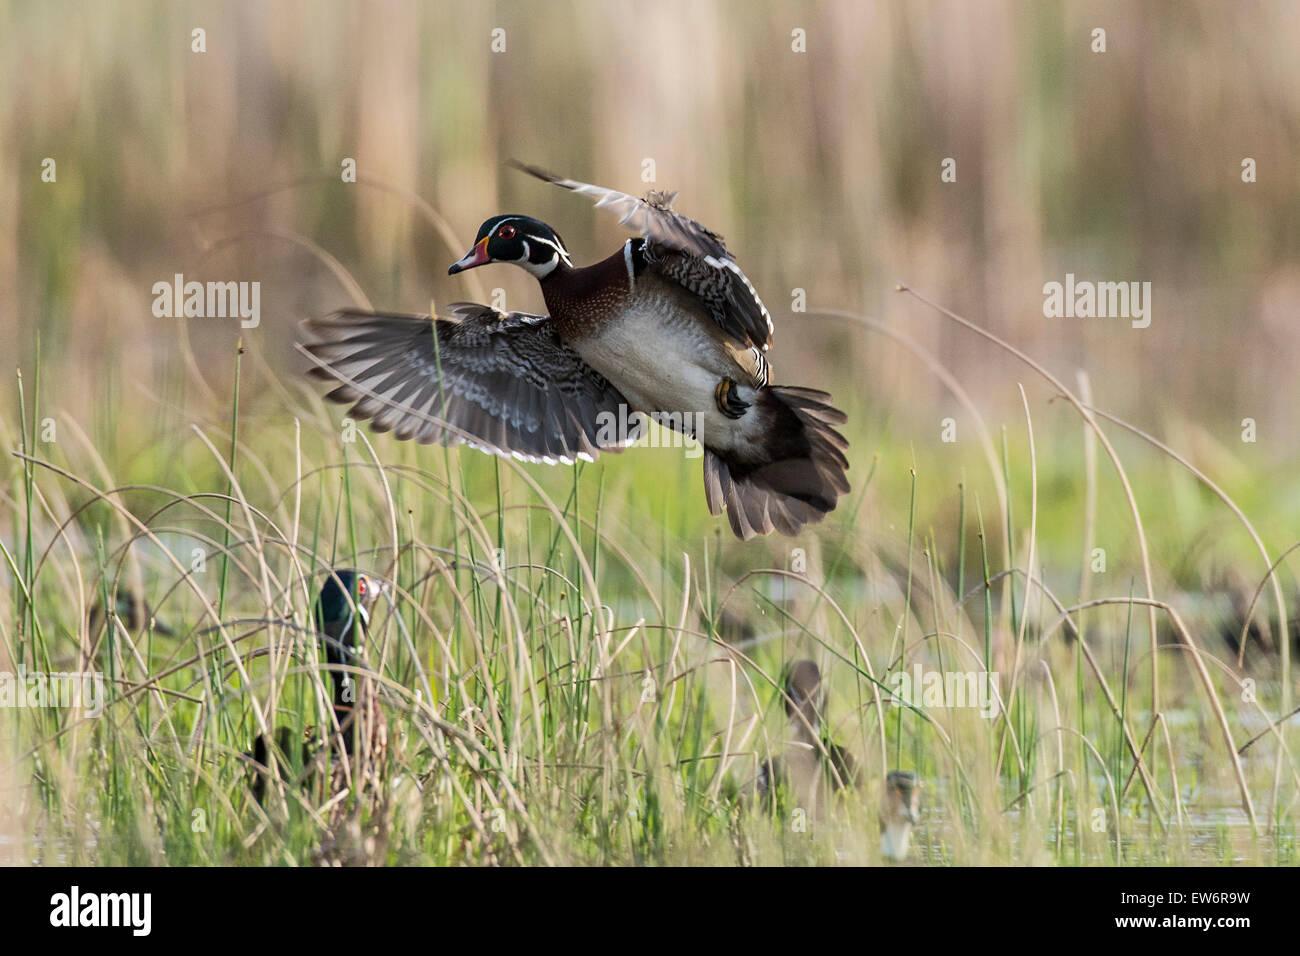 Flying Wood Ducks